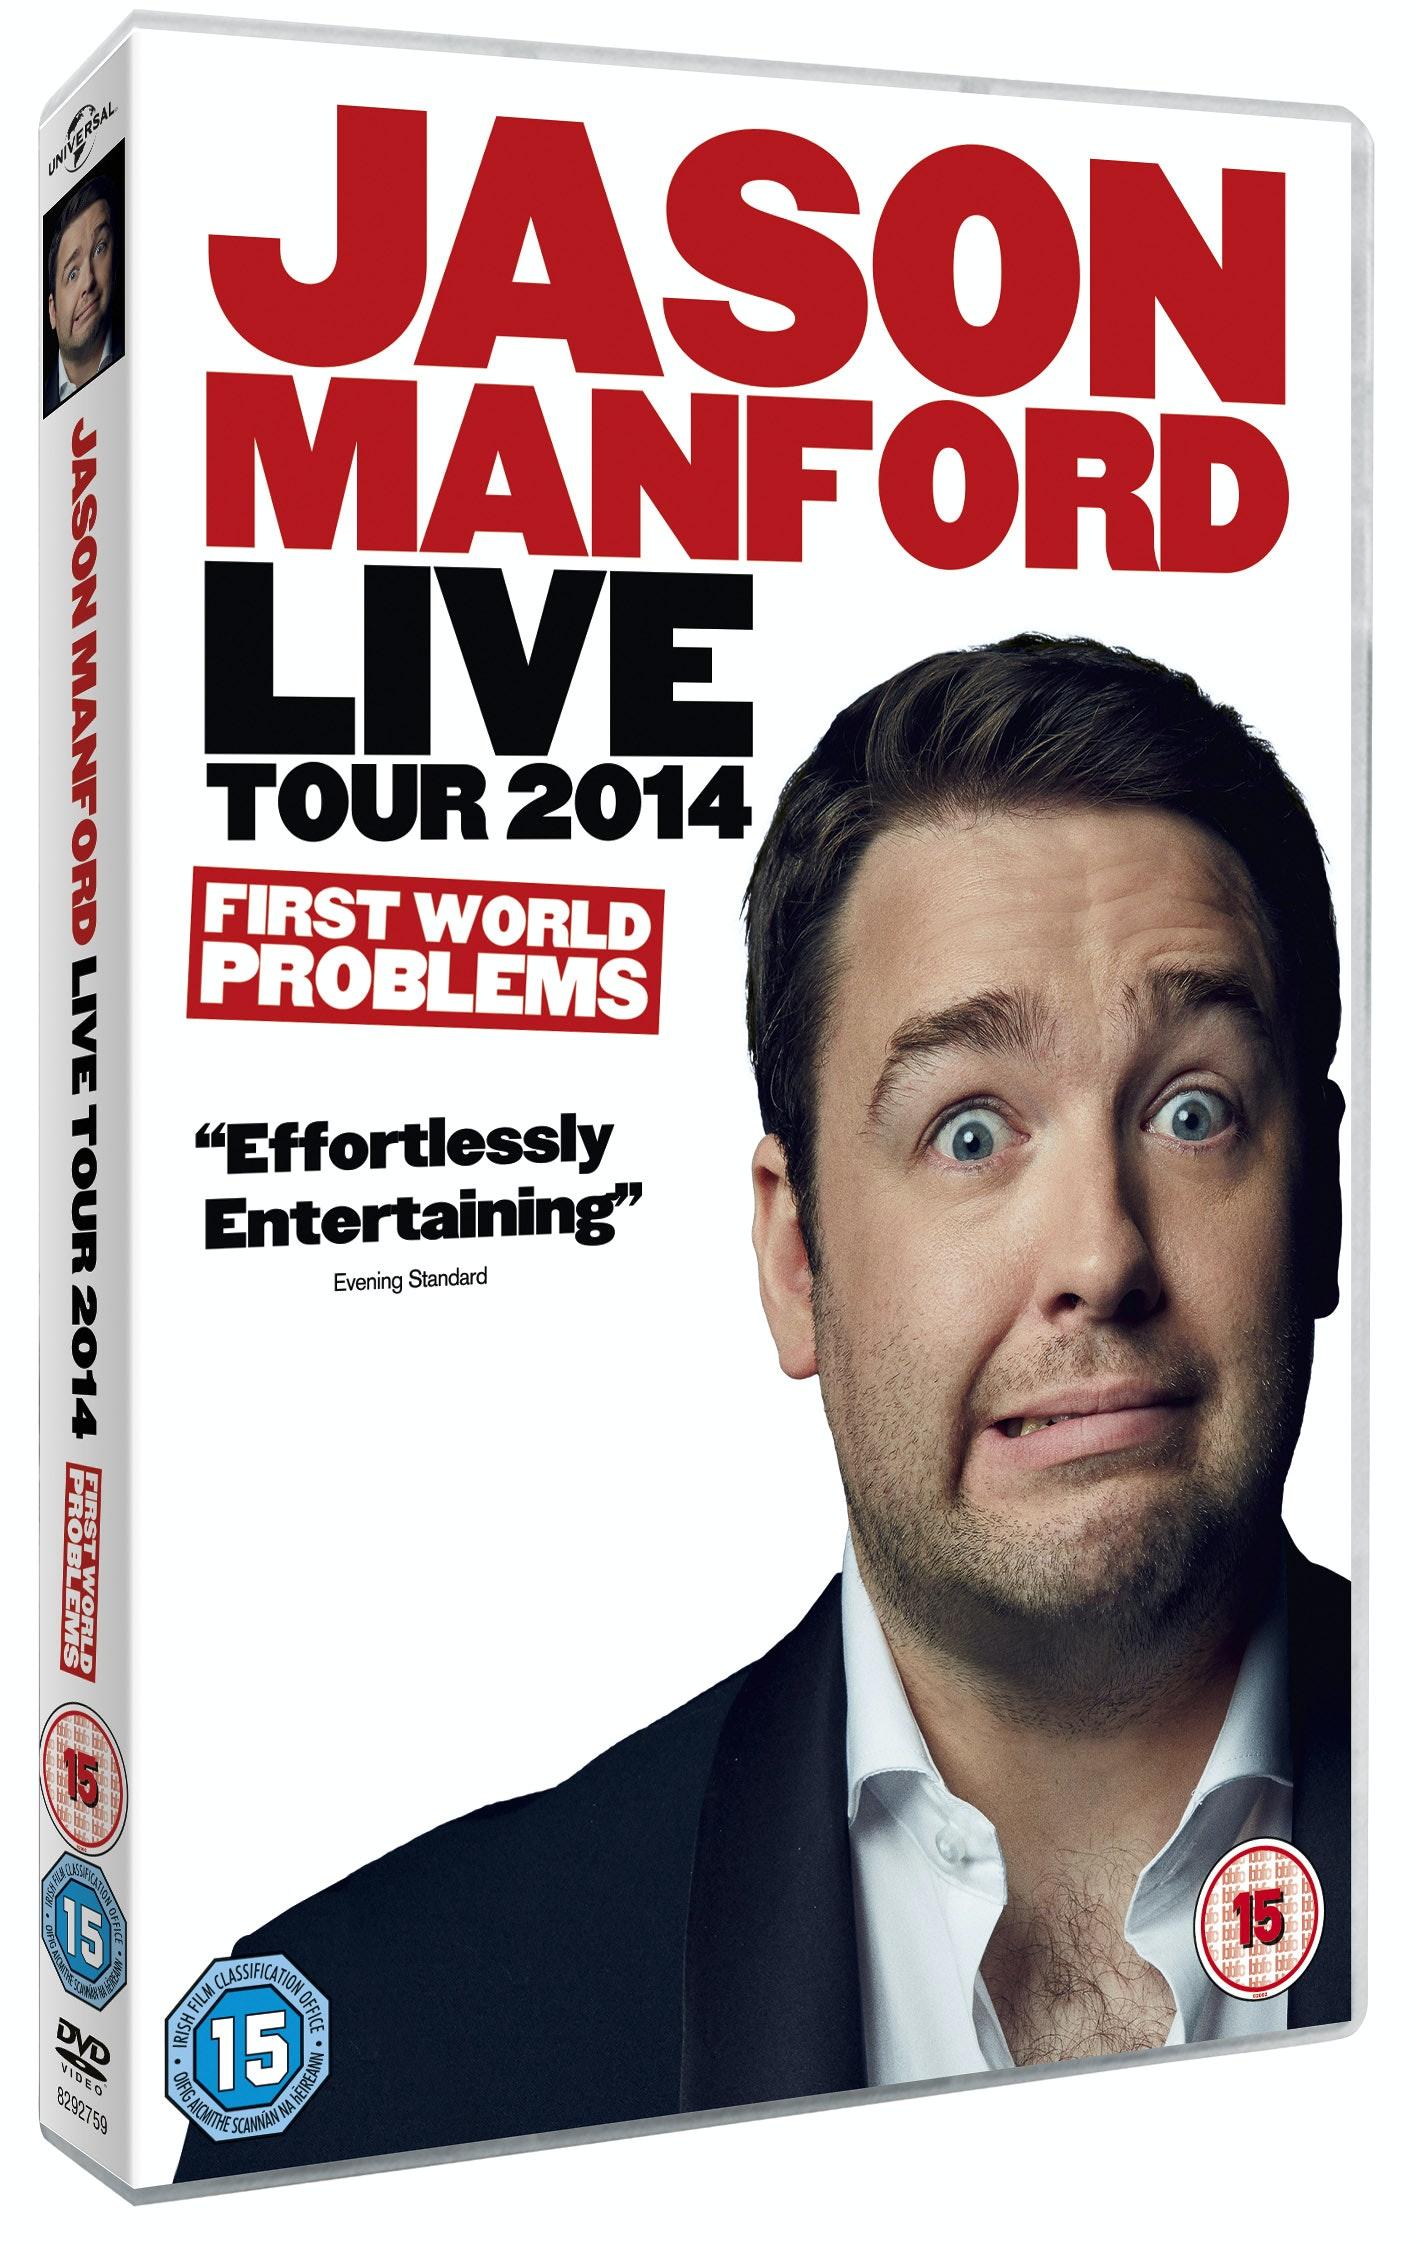 Jason Manford sweepstakes